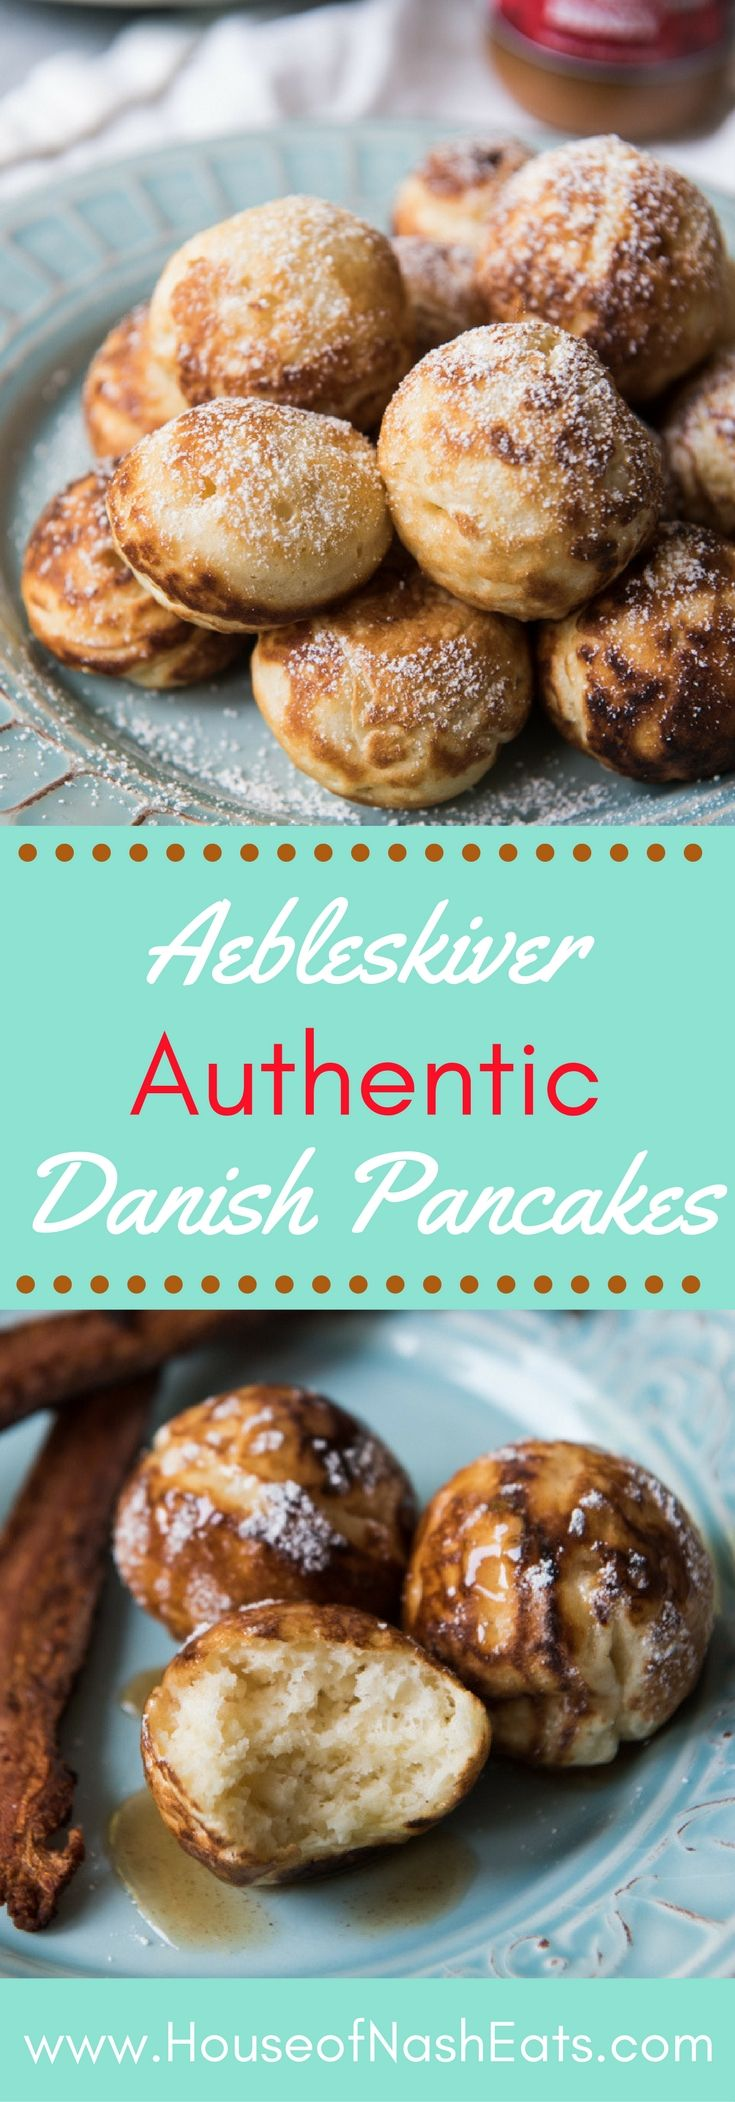 Photo of Aebleskiver | Danish Pancakes